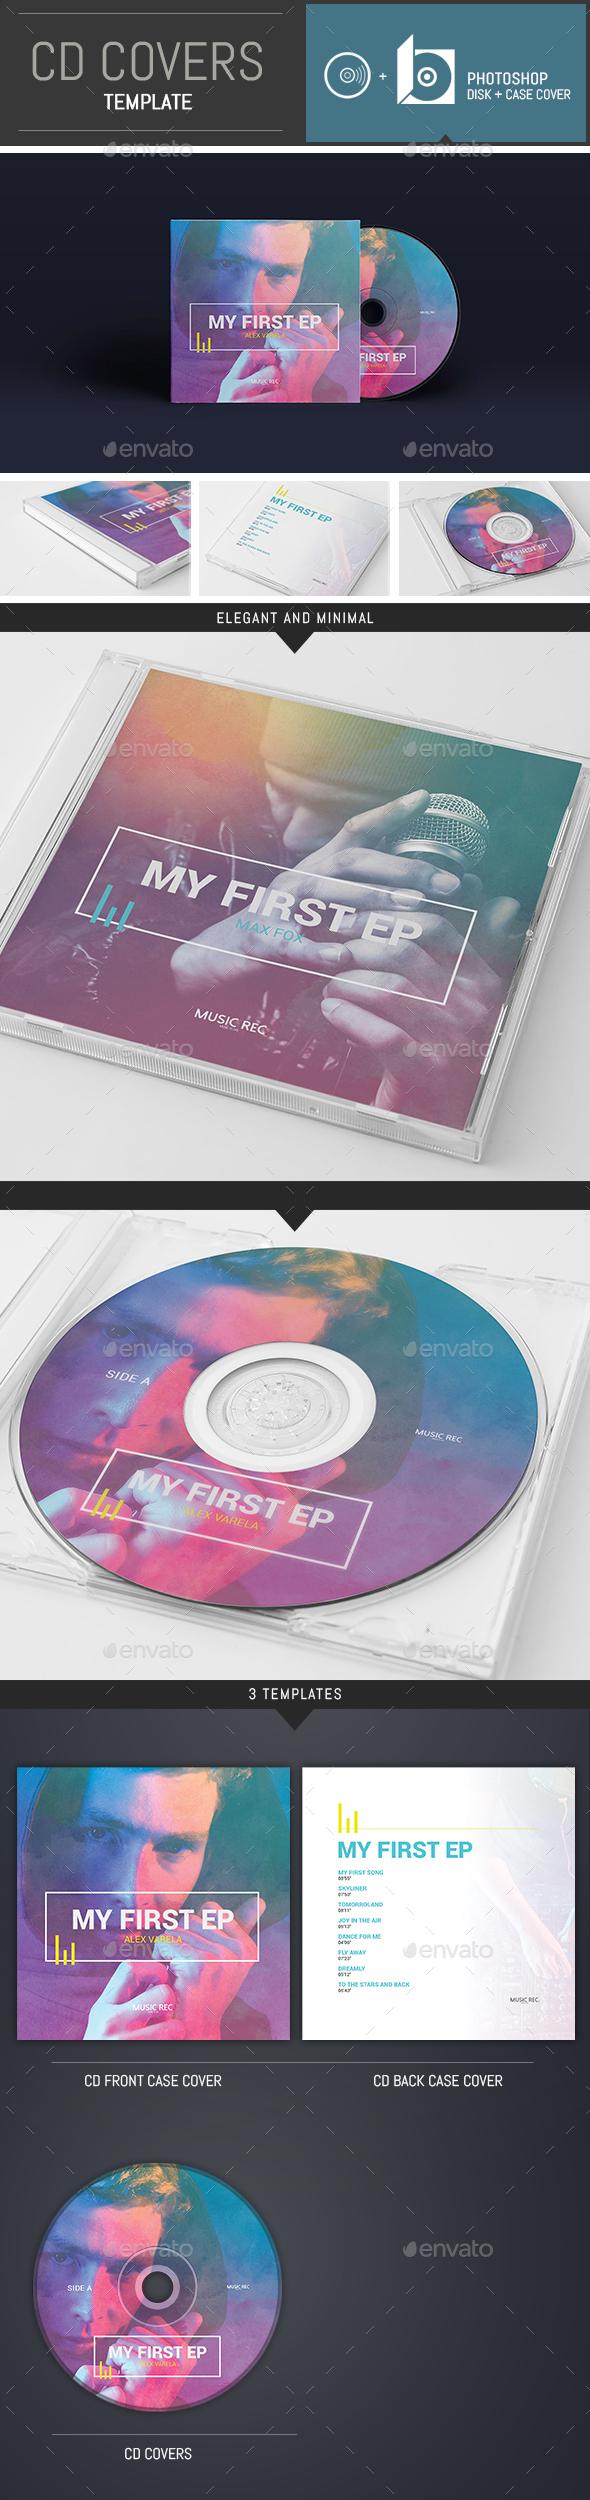 DJ / Musician / Band CD Cover Template - CD & DVD Artwork Print Templates